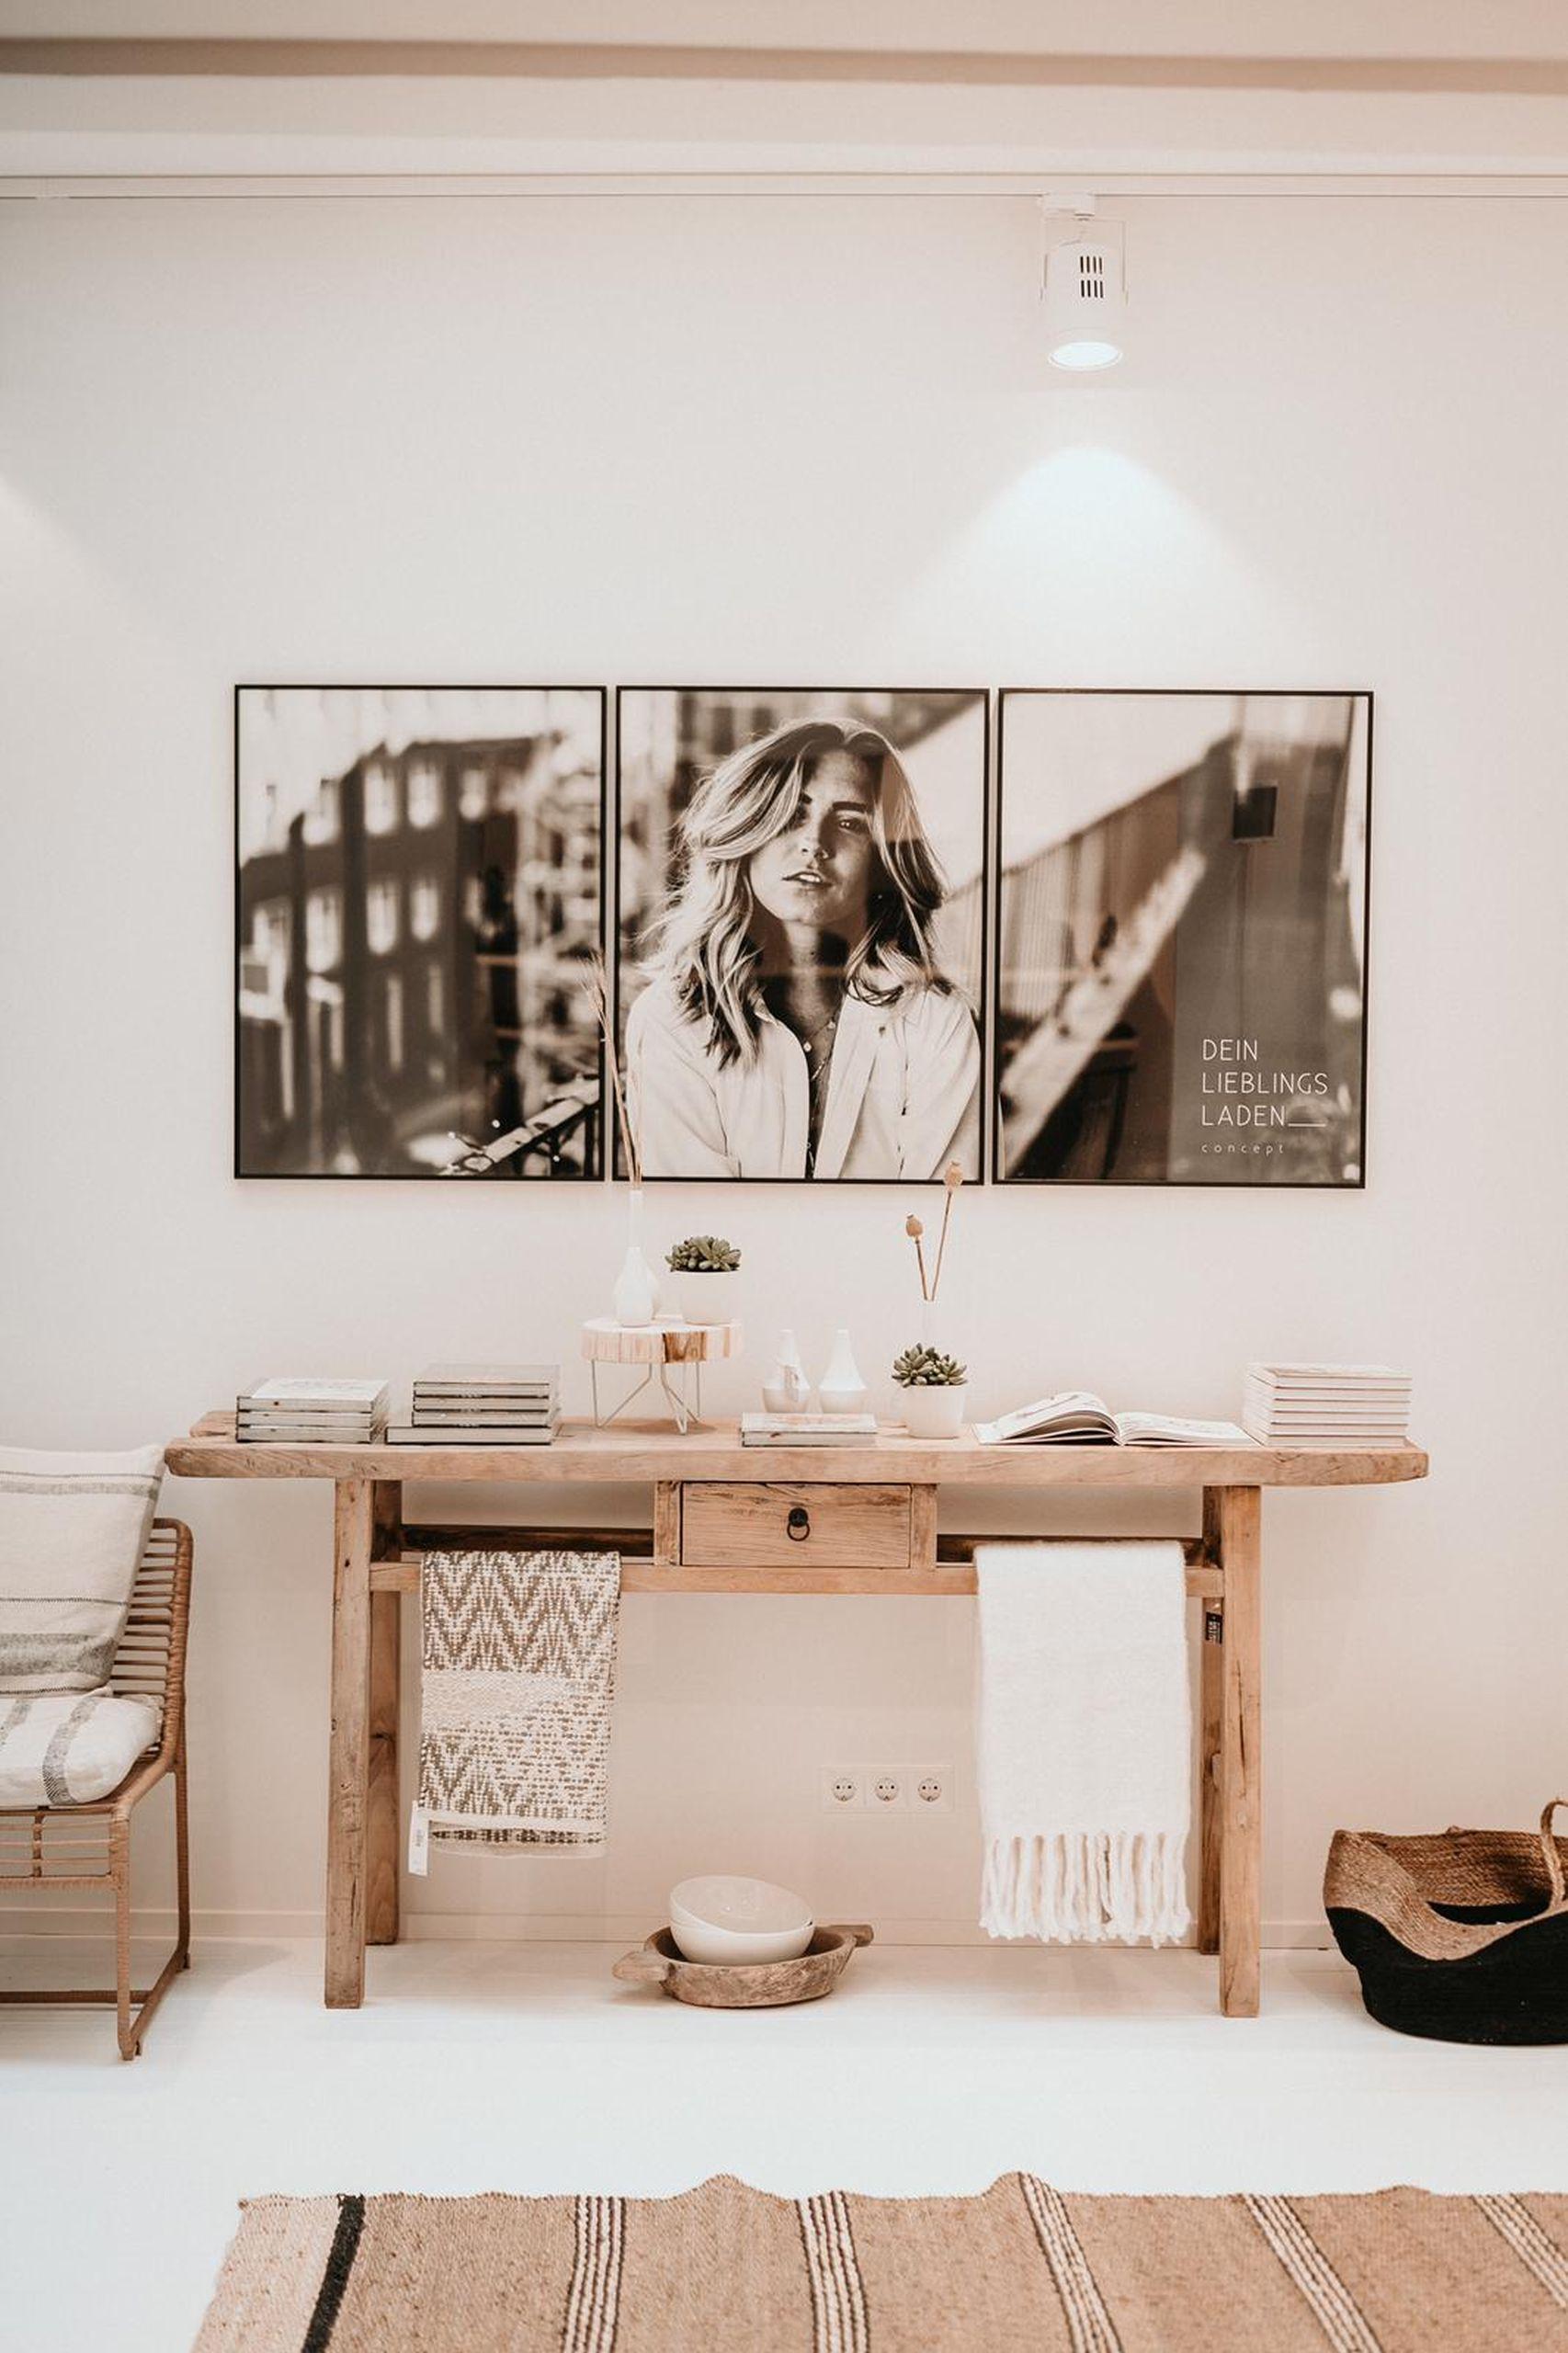 Dein Lieblingsladen Concept Store